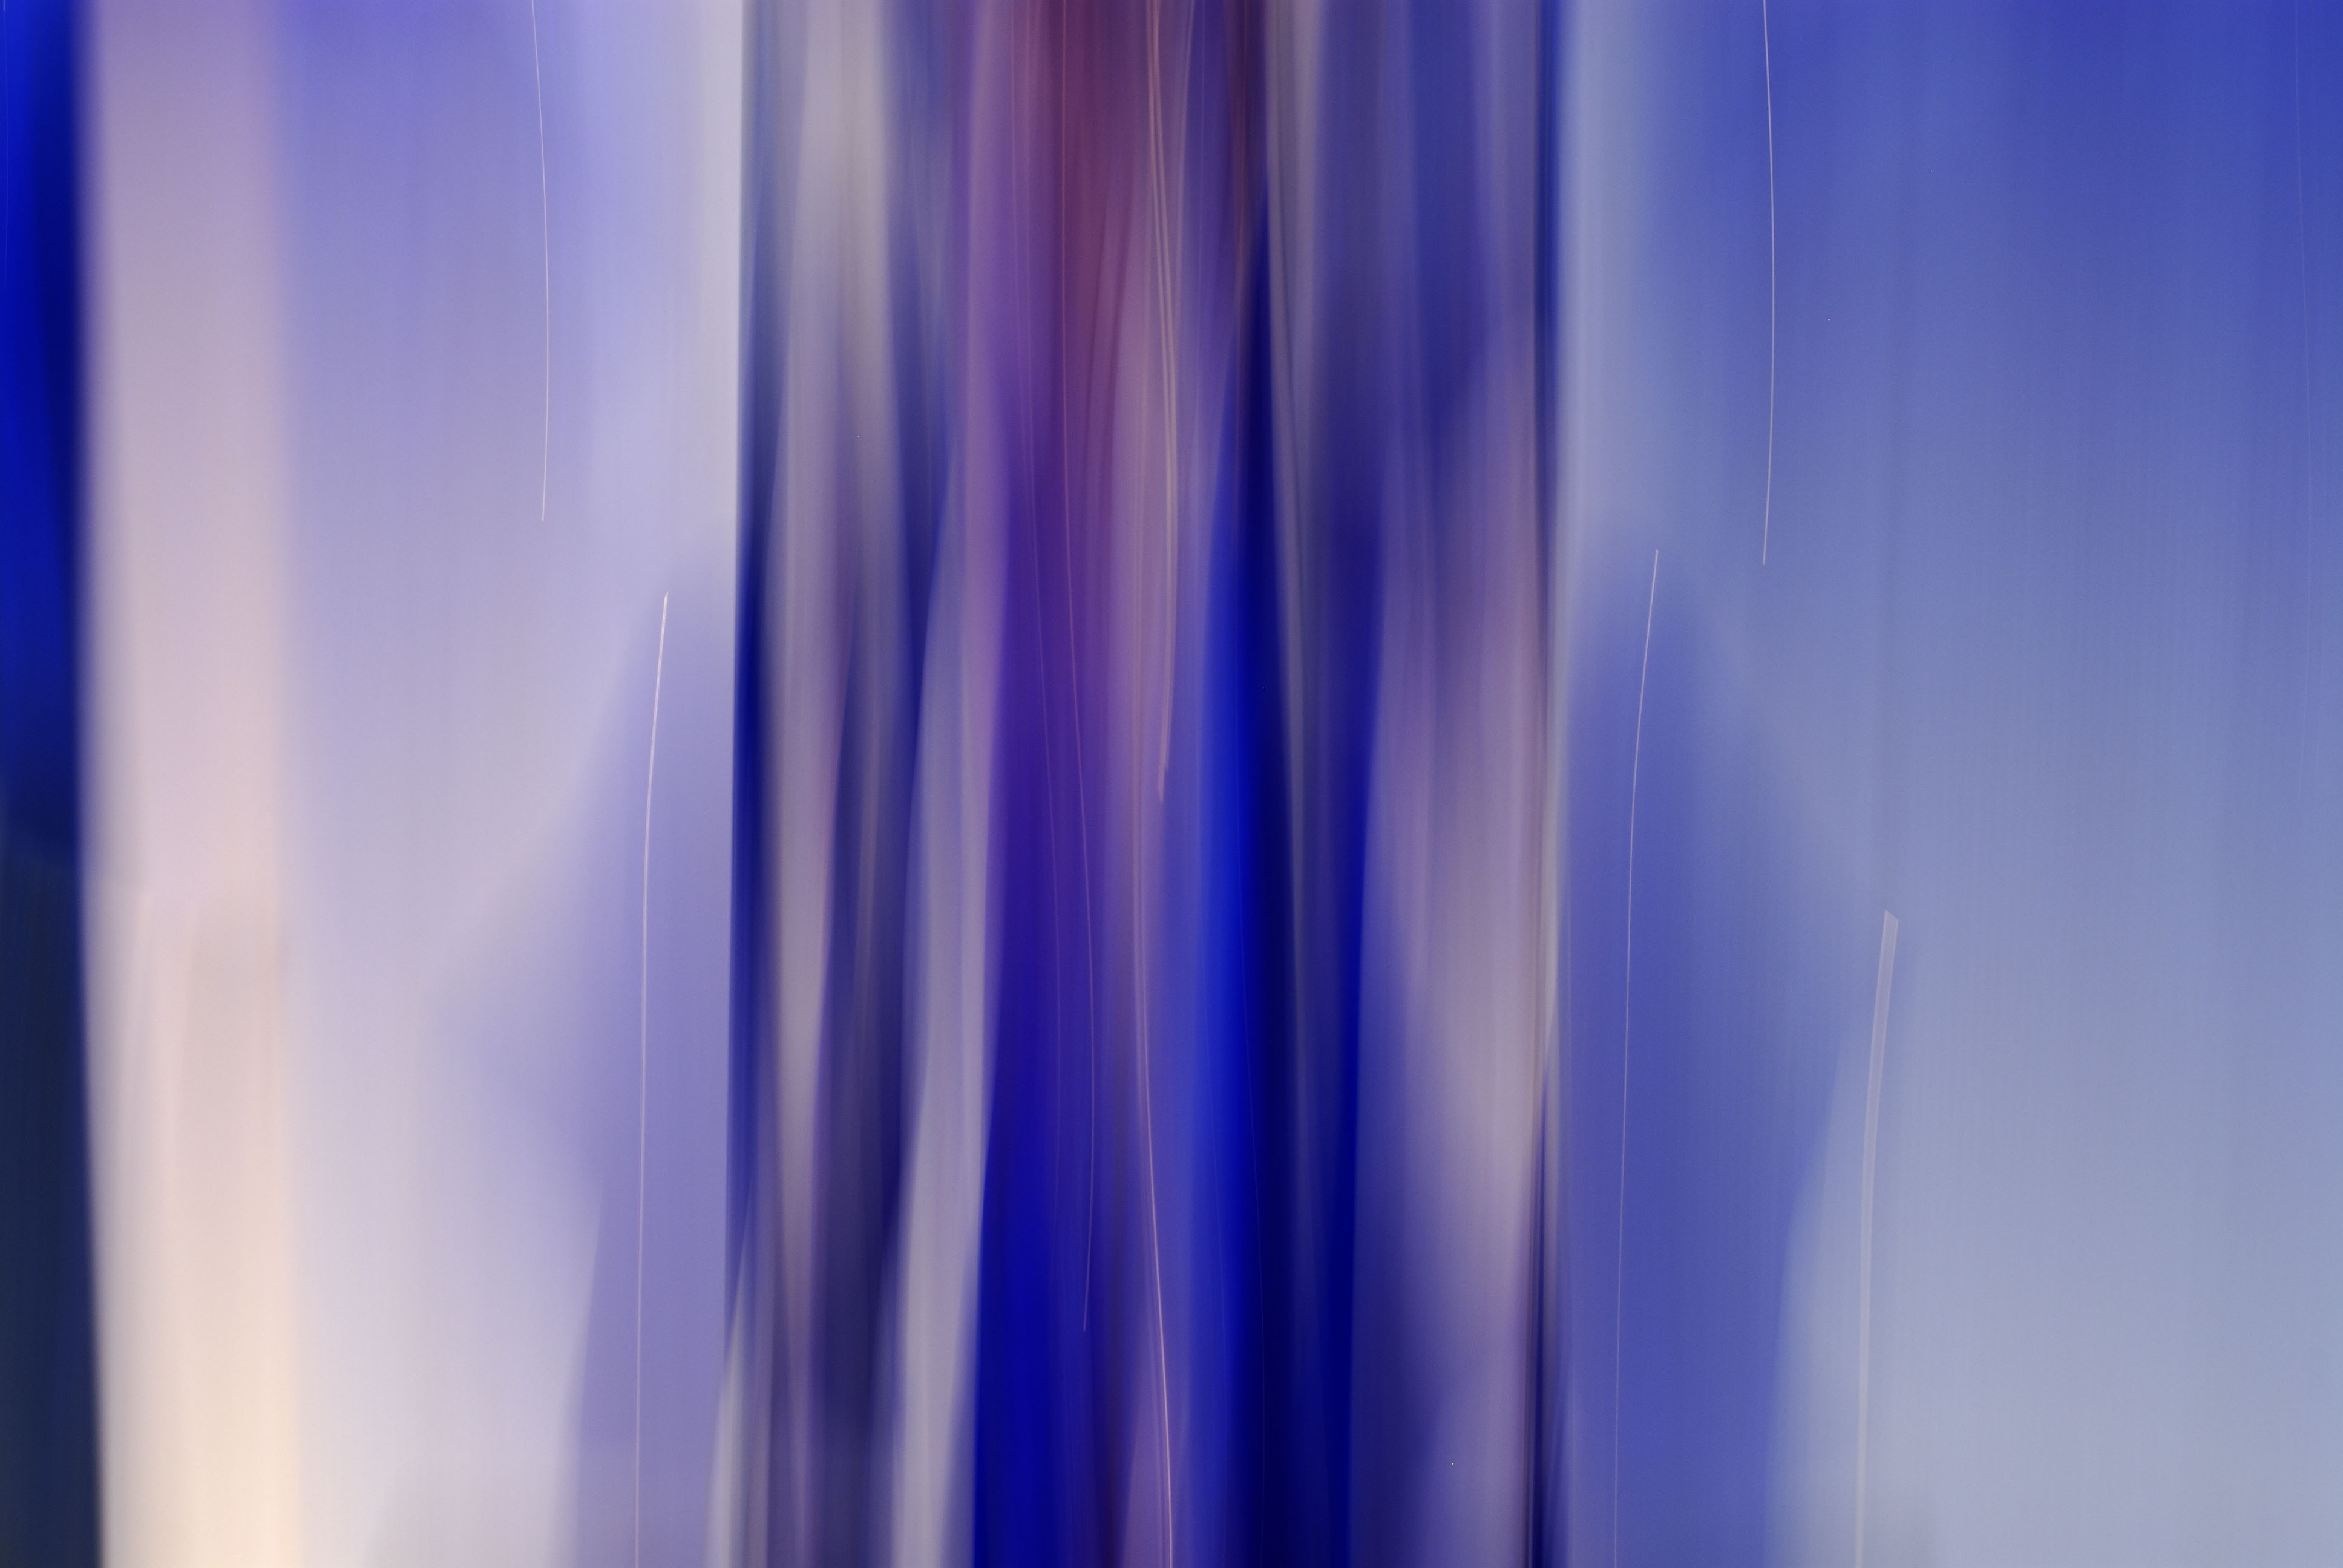 Foto van vage blauwe en paarse vormen met veel wit